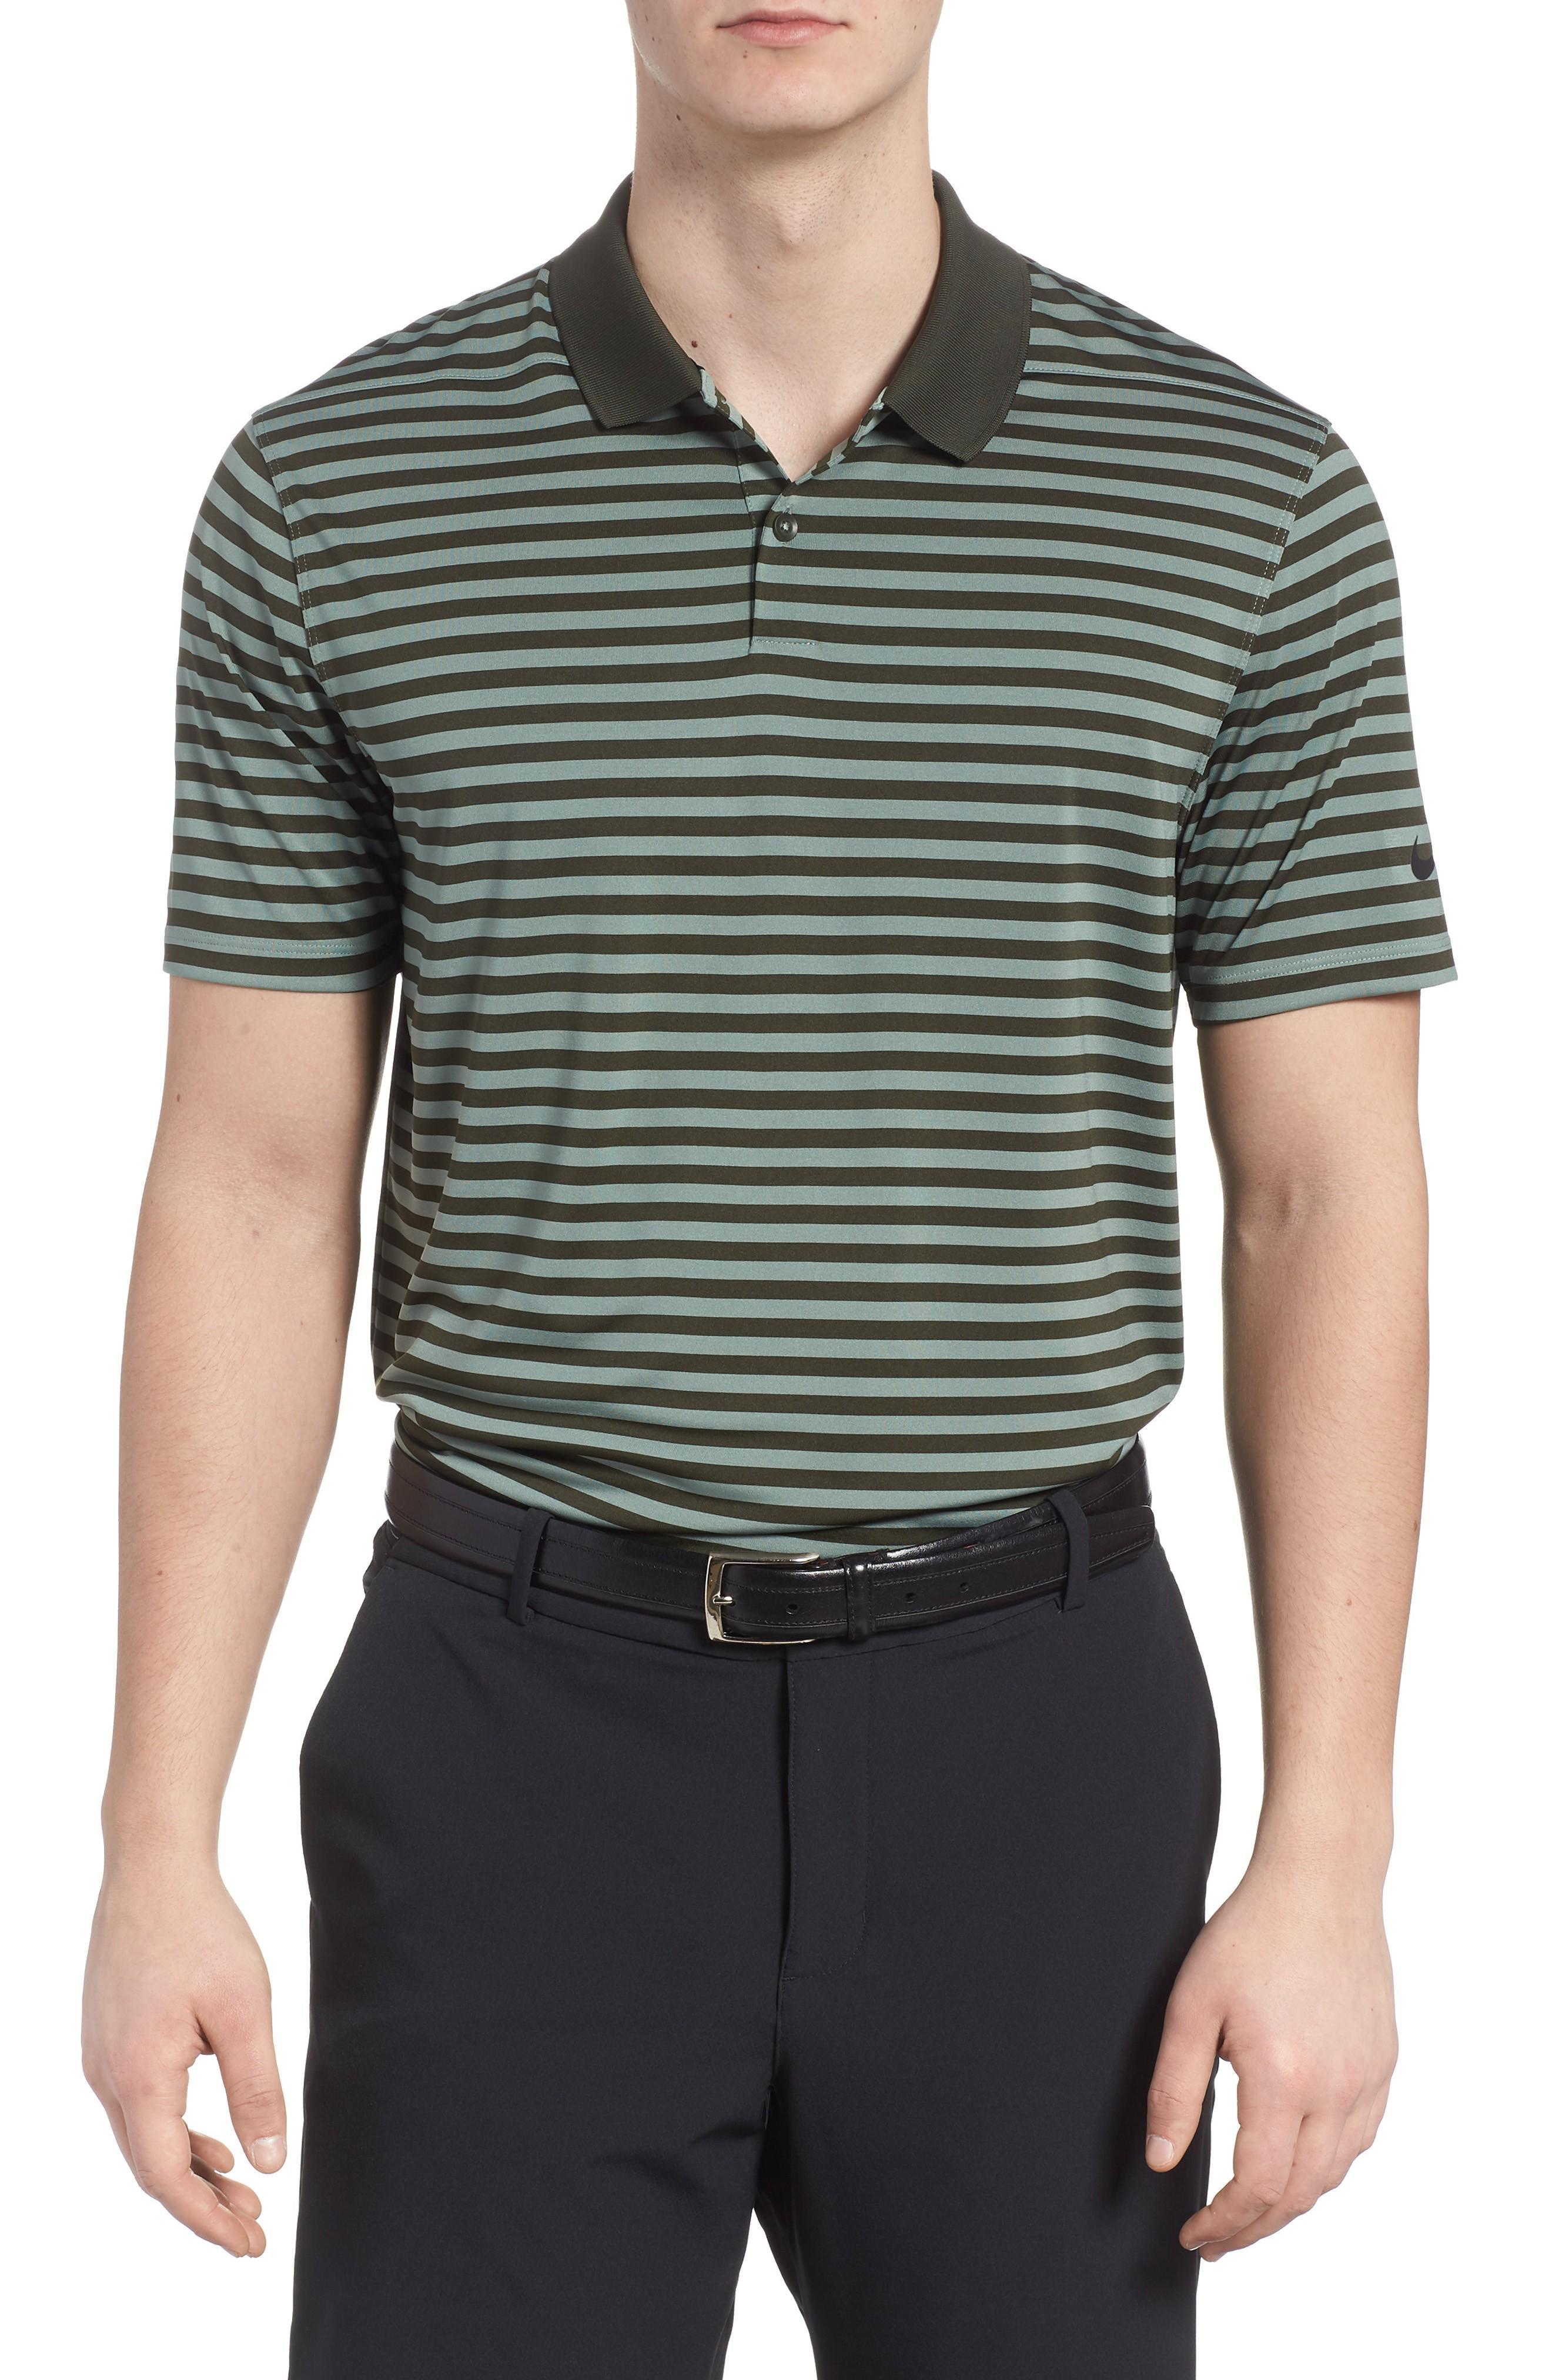 21b9b1a12 Nike Dry Victory Stripe Golf Polo In Sequoia/ Clay Green/ Black ...